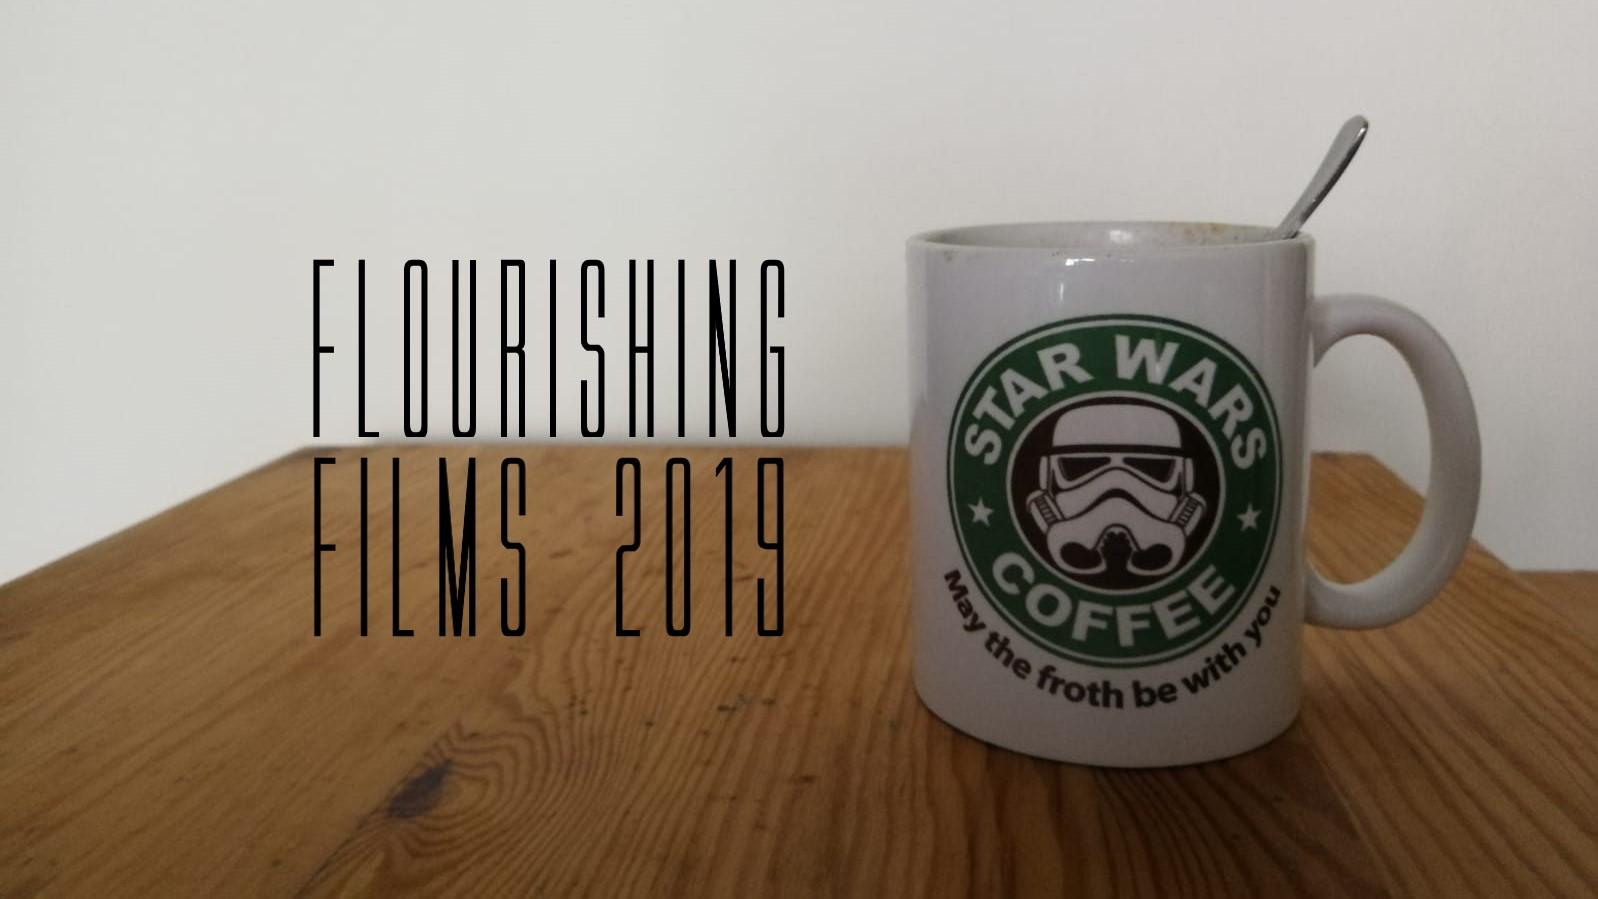 Flourishing Films 2019 - Die besten Filme 2019